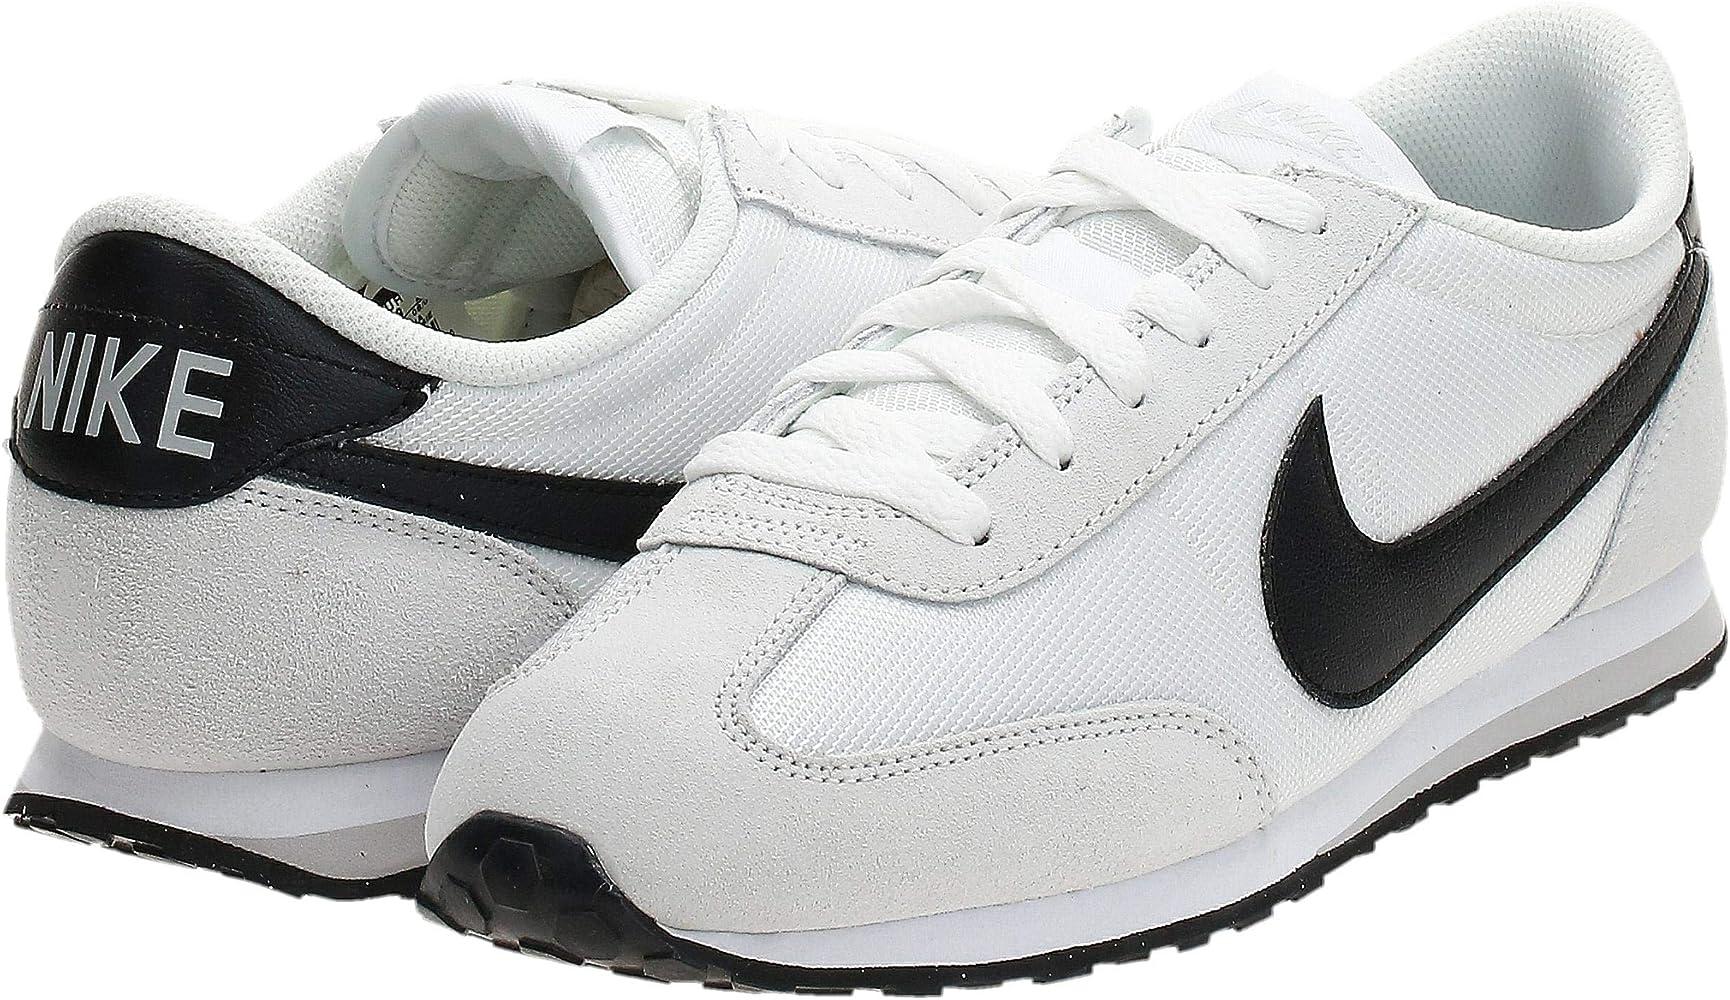 Agricultura por supuesto ladrón  Amazon.com | Nike Men's Low-Top Sneakers, Multicolour White Black Neutral  Grey 001, Women 2 | Road Running